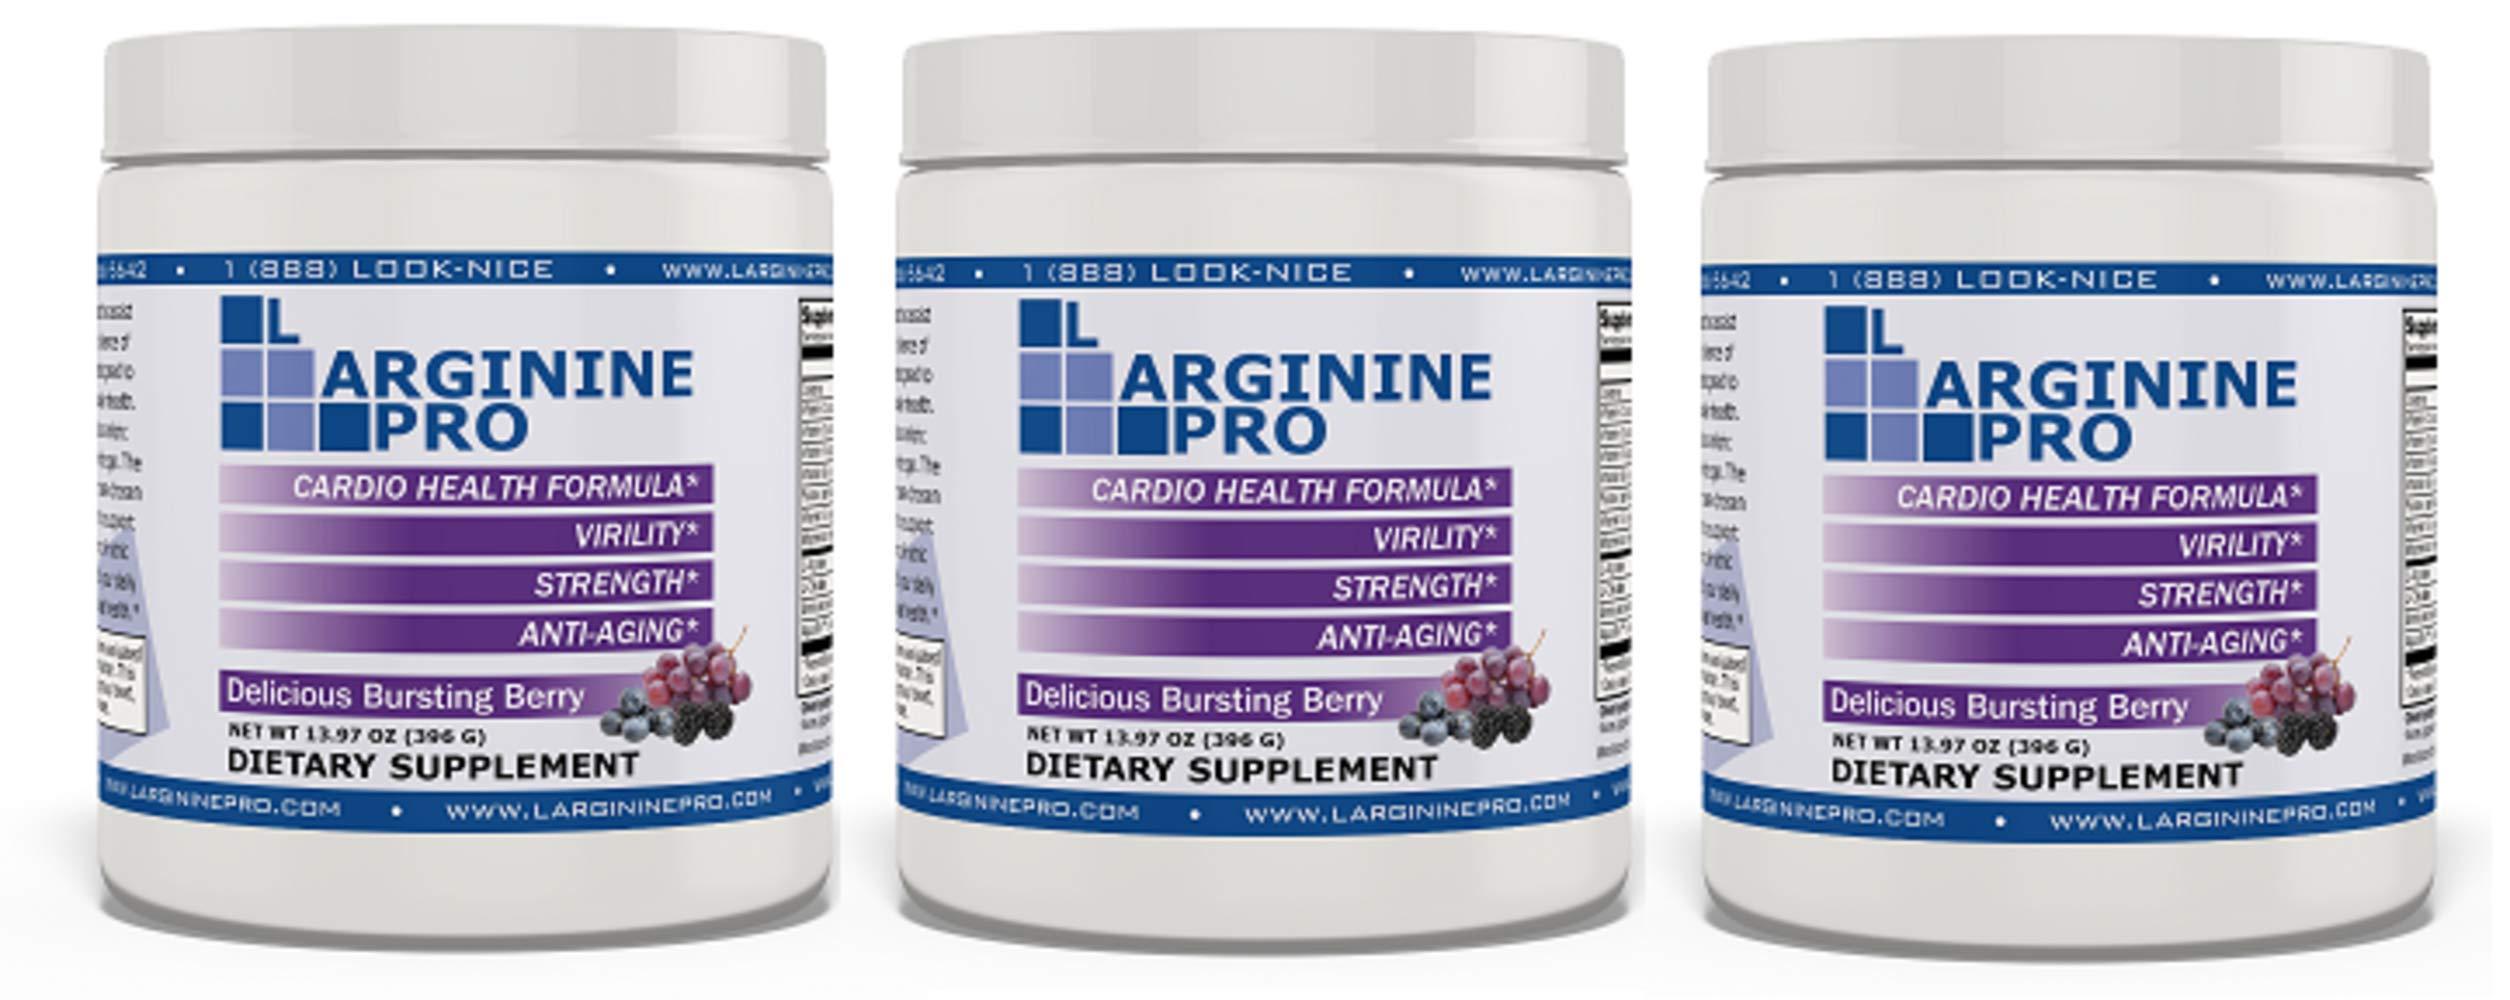 L-arginine Pro, 1 NOW L-arginine Supplement - 5,500mg of L-arginine PLUS 1,100mg L-Citrulline + Vitamins & Minerals for Cardio Health, Blood Pressure, Cholesterol, Energy (Berry, 3 Jars) by L-arginine Pro (Image #1)